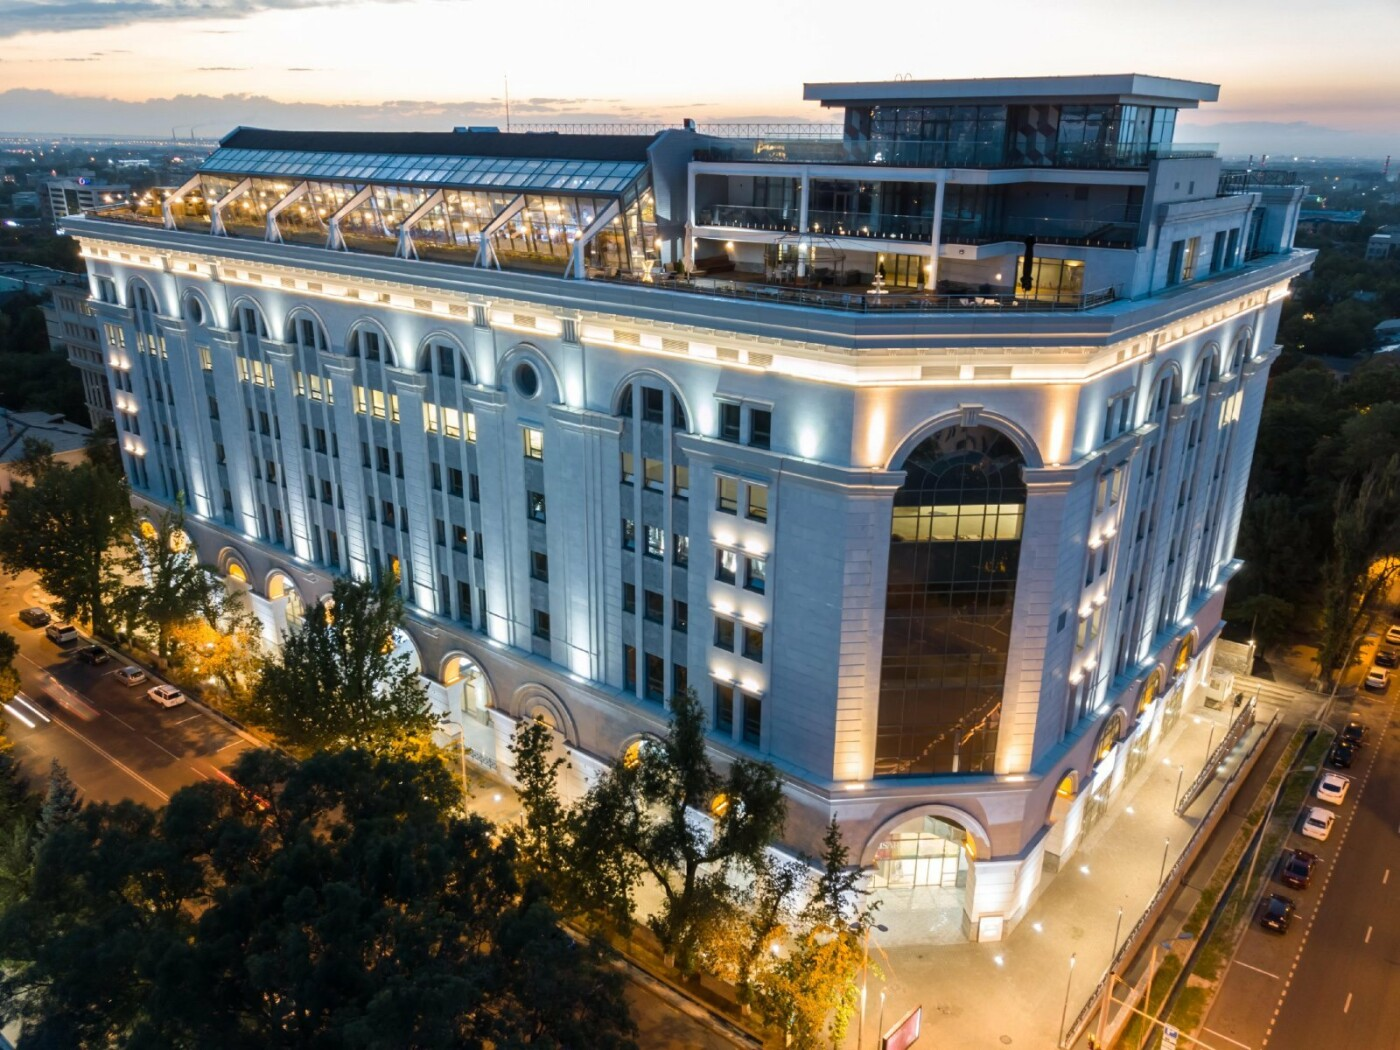 Торговый центр на Желтоксан- Богенбай батыра - Фото: 2 ГИС